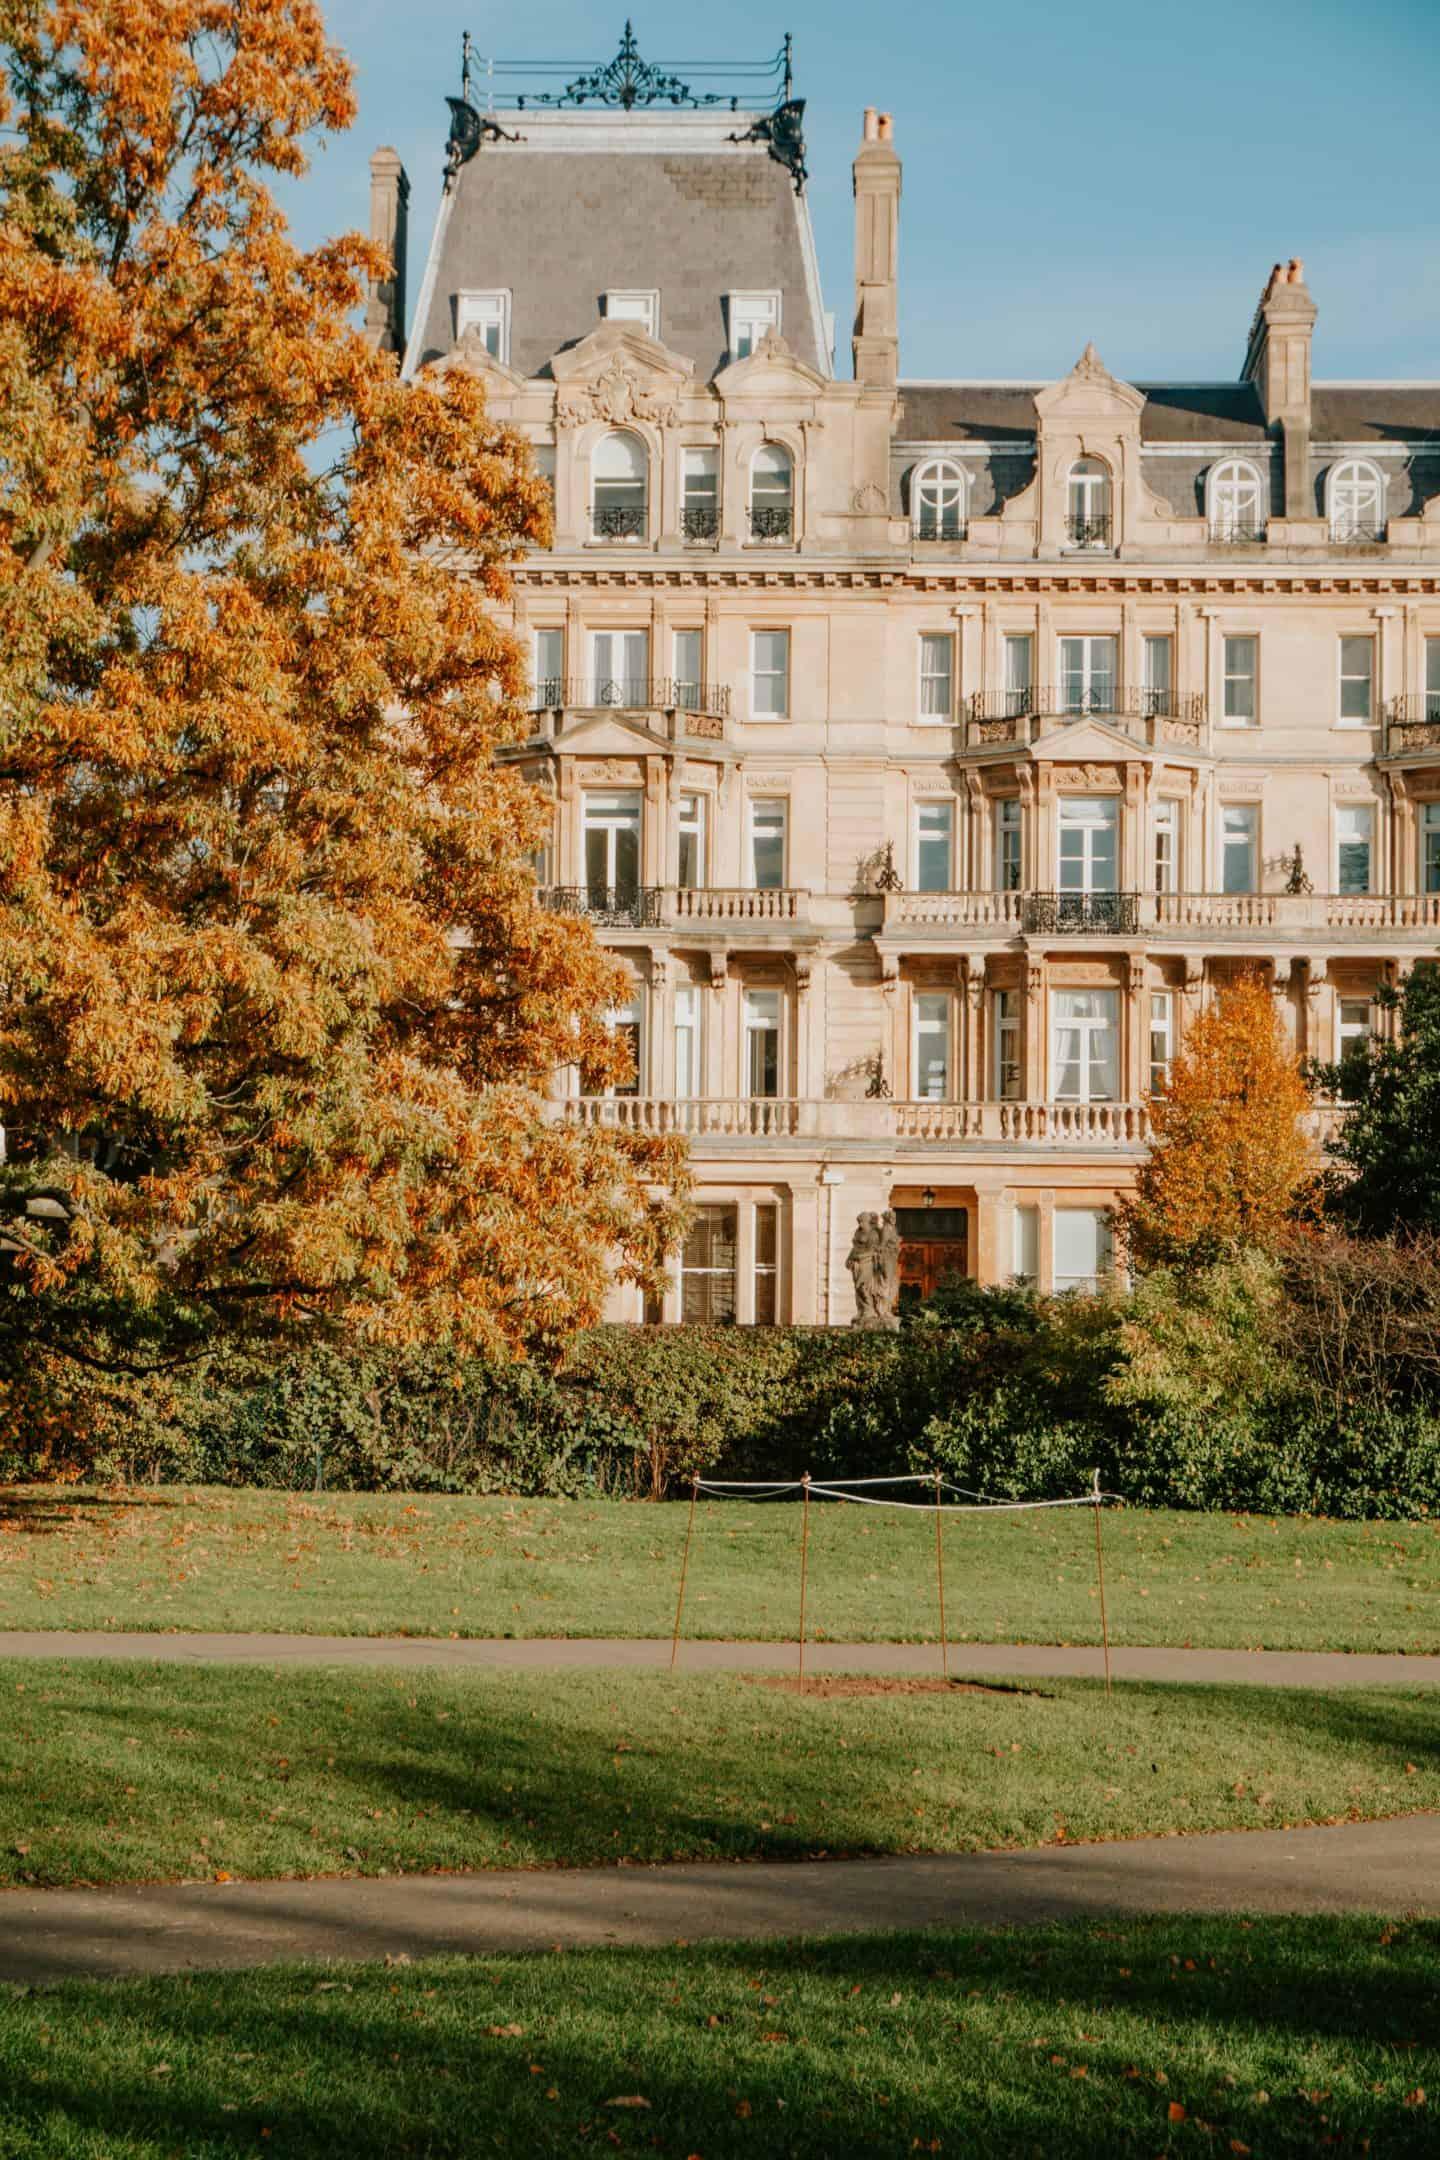 Autumn Day in London